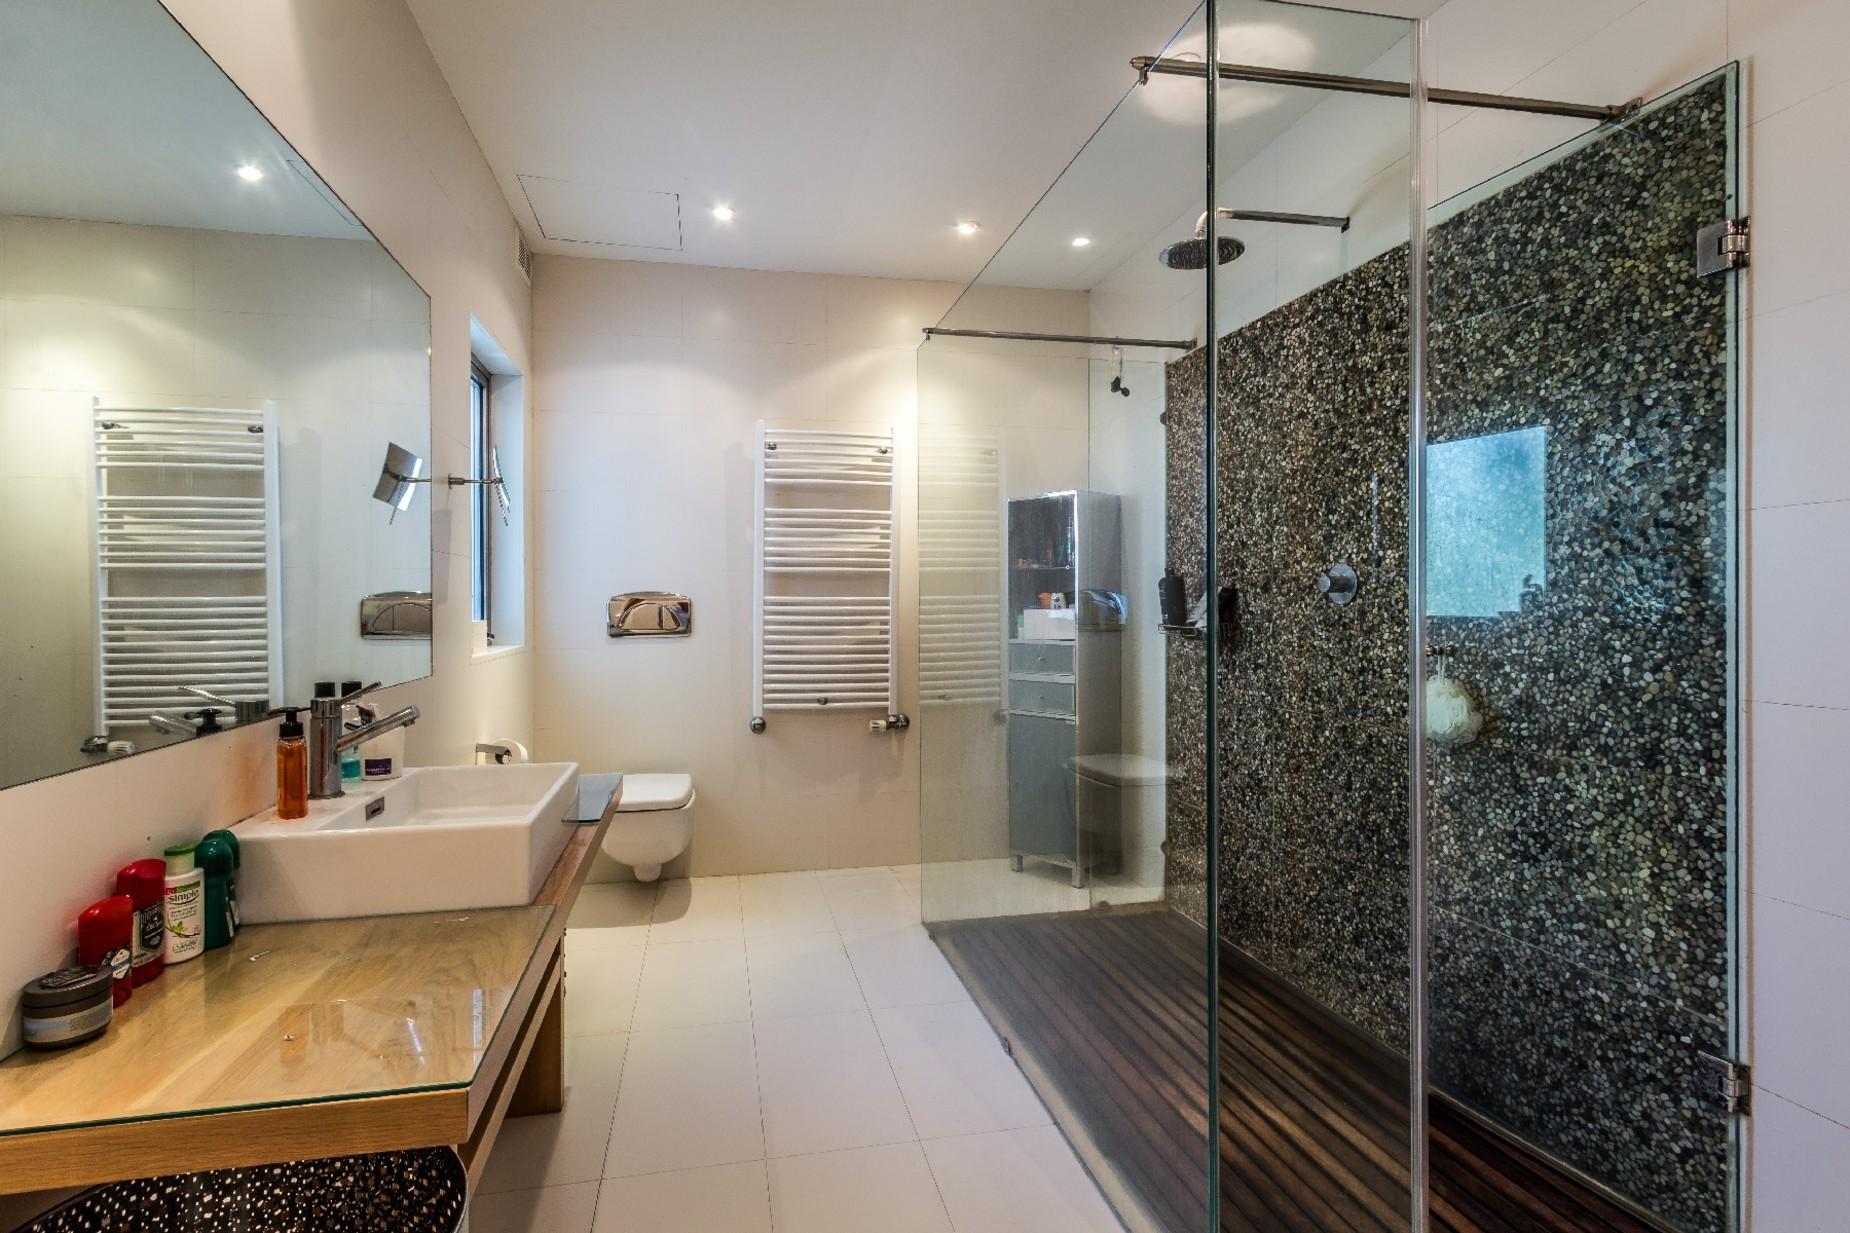 7 bed Villa For Sale in Bahar ic-Caghaq, Bahar ic-Caghaq - thumb 24